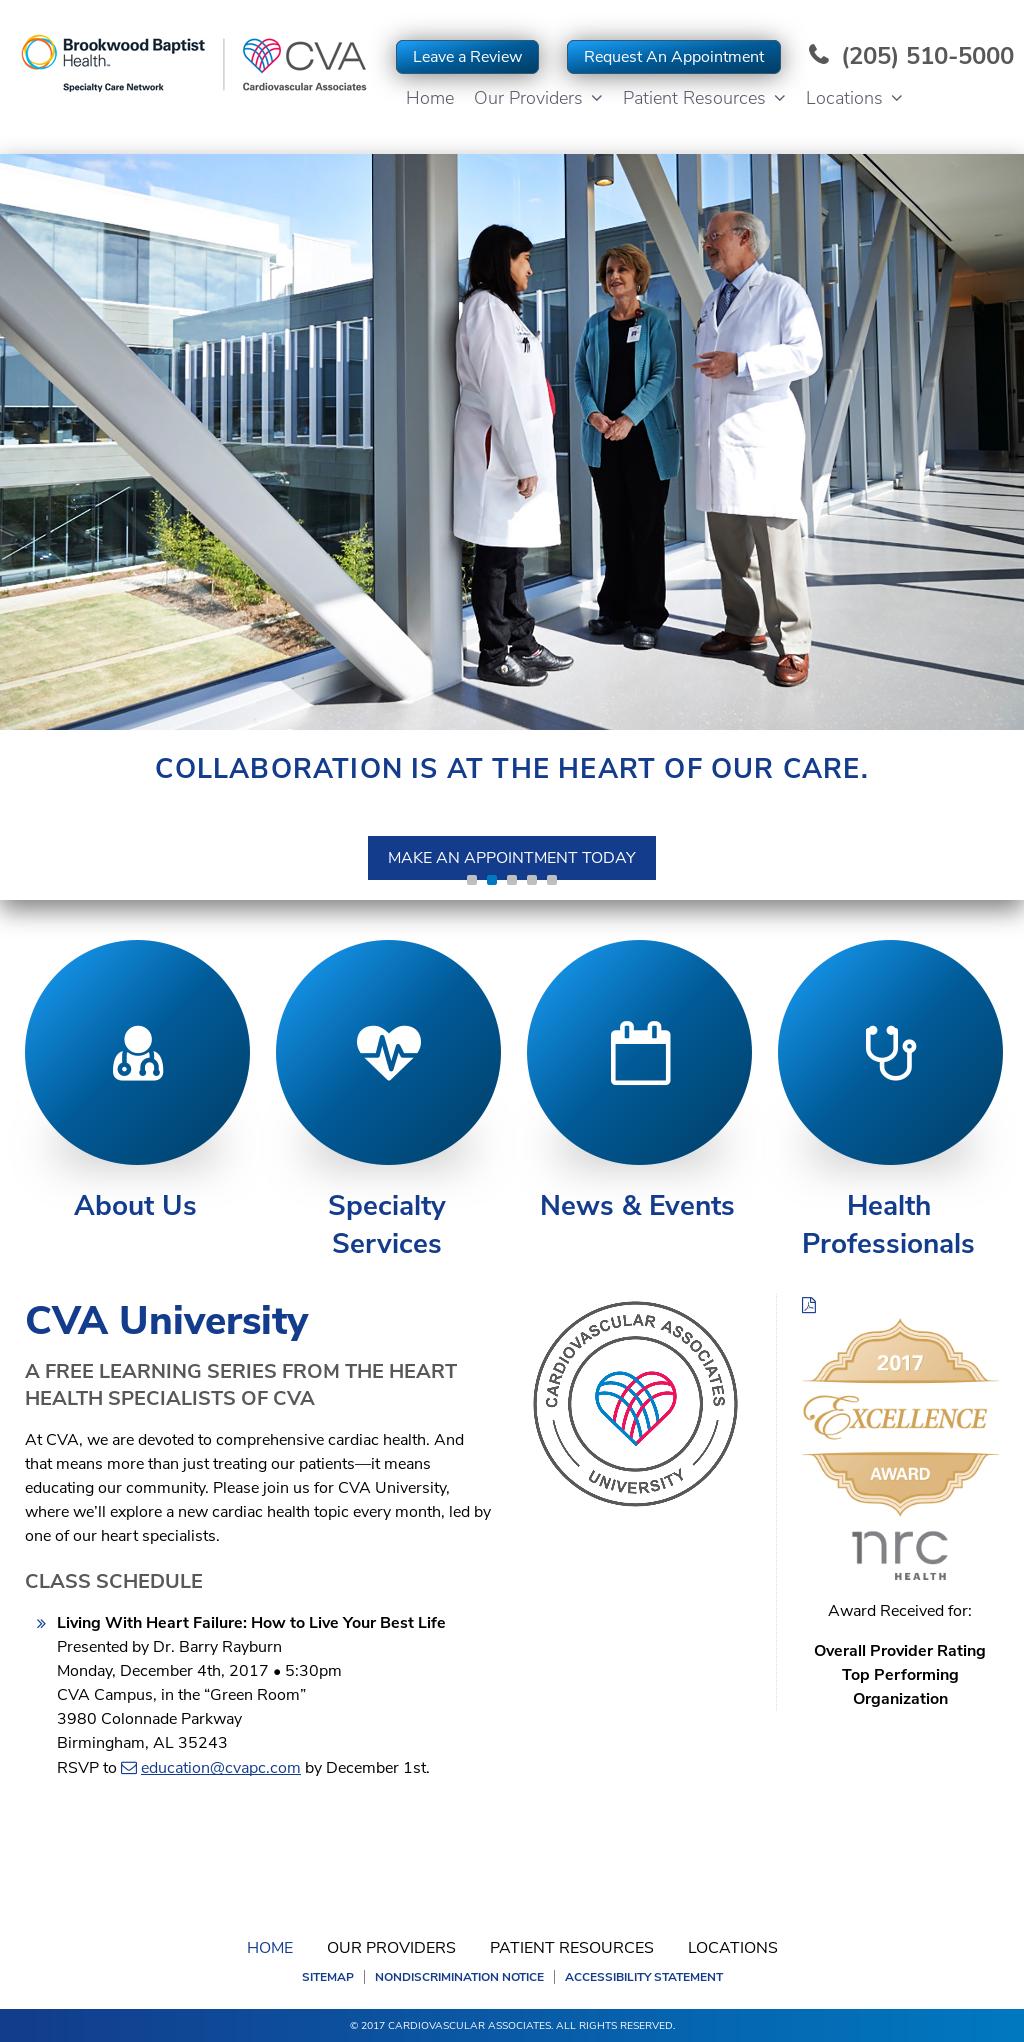 Cvapc Competitors, Revenue and Employees - Owler Company Profile